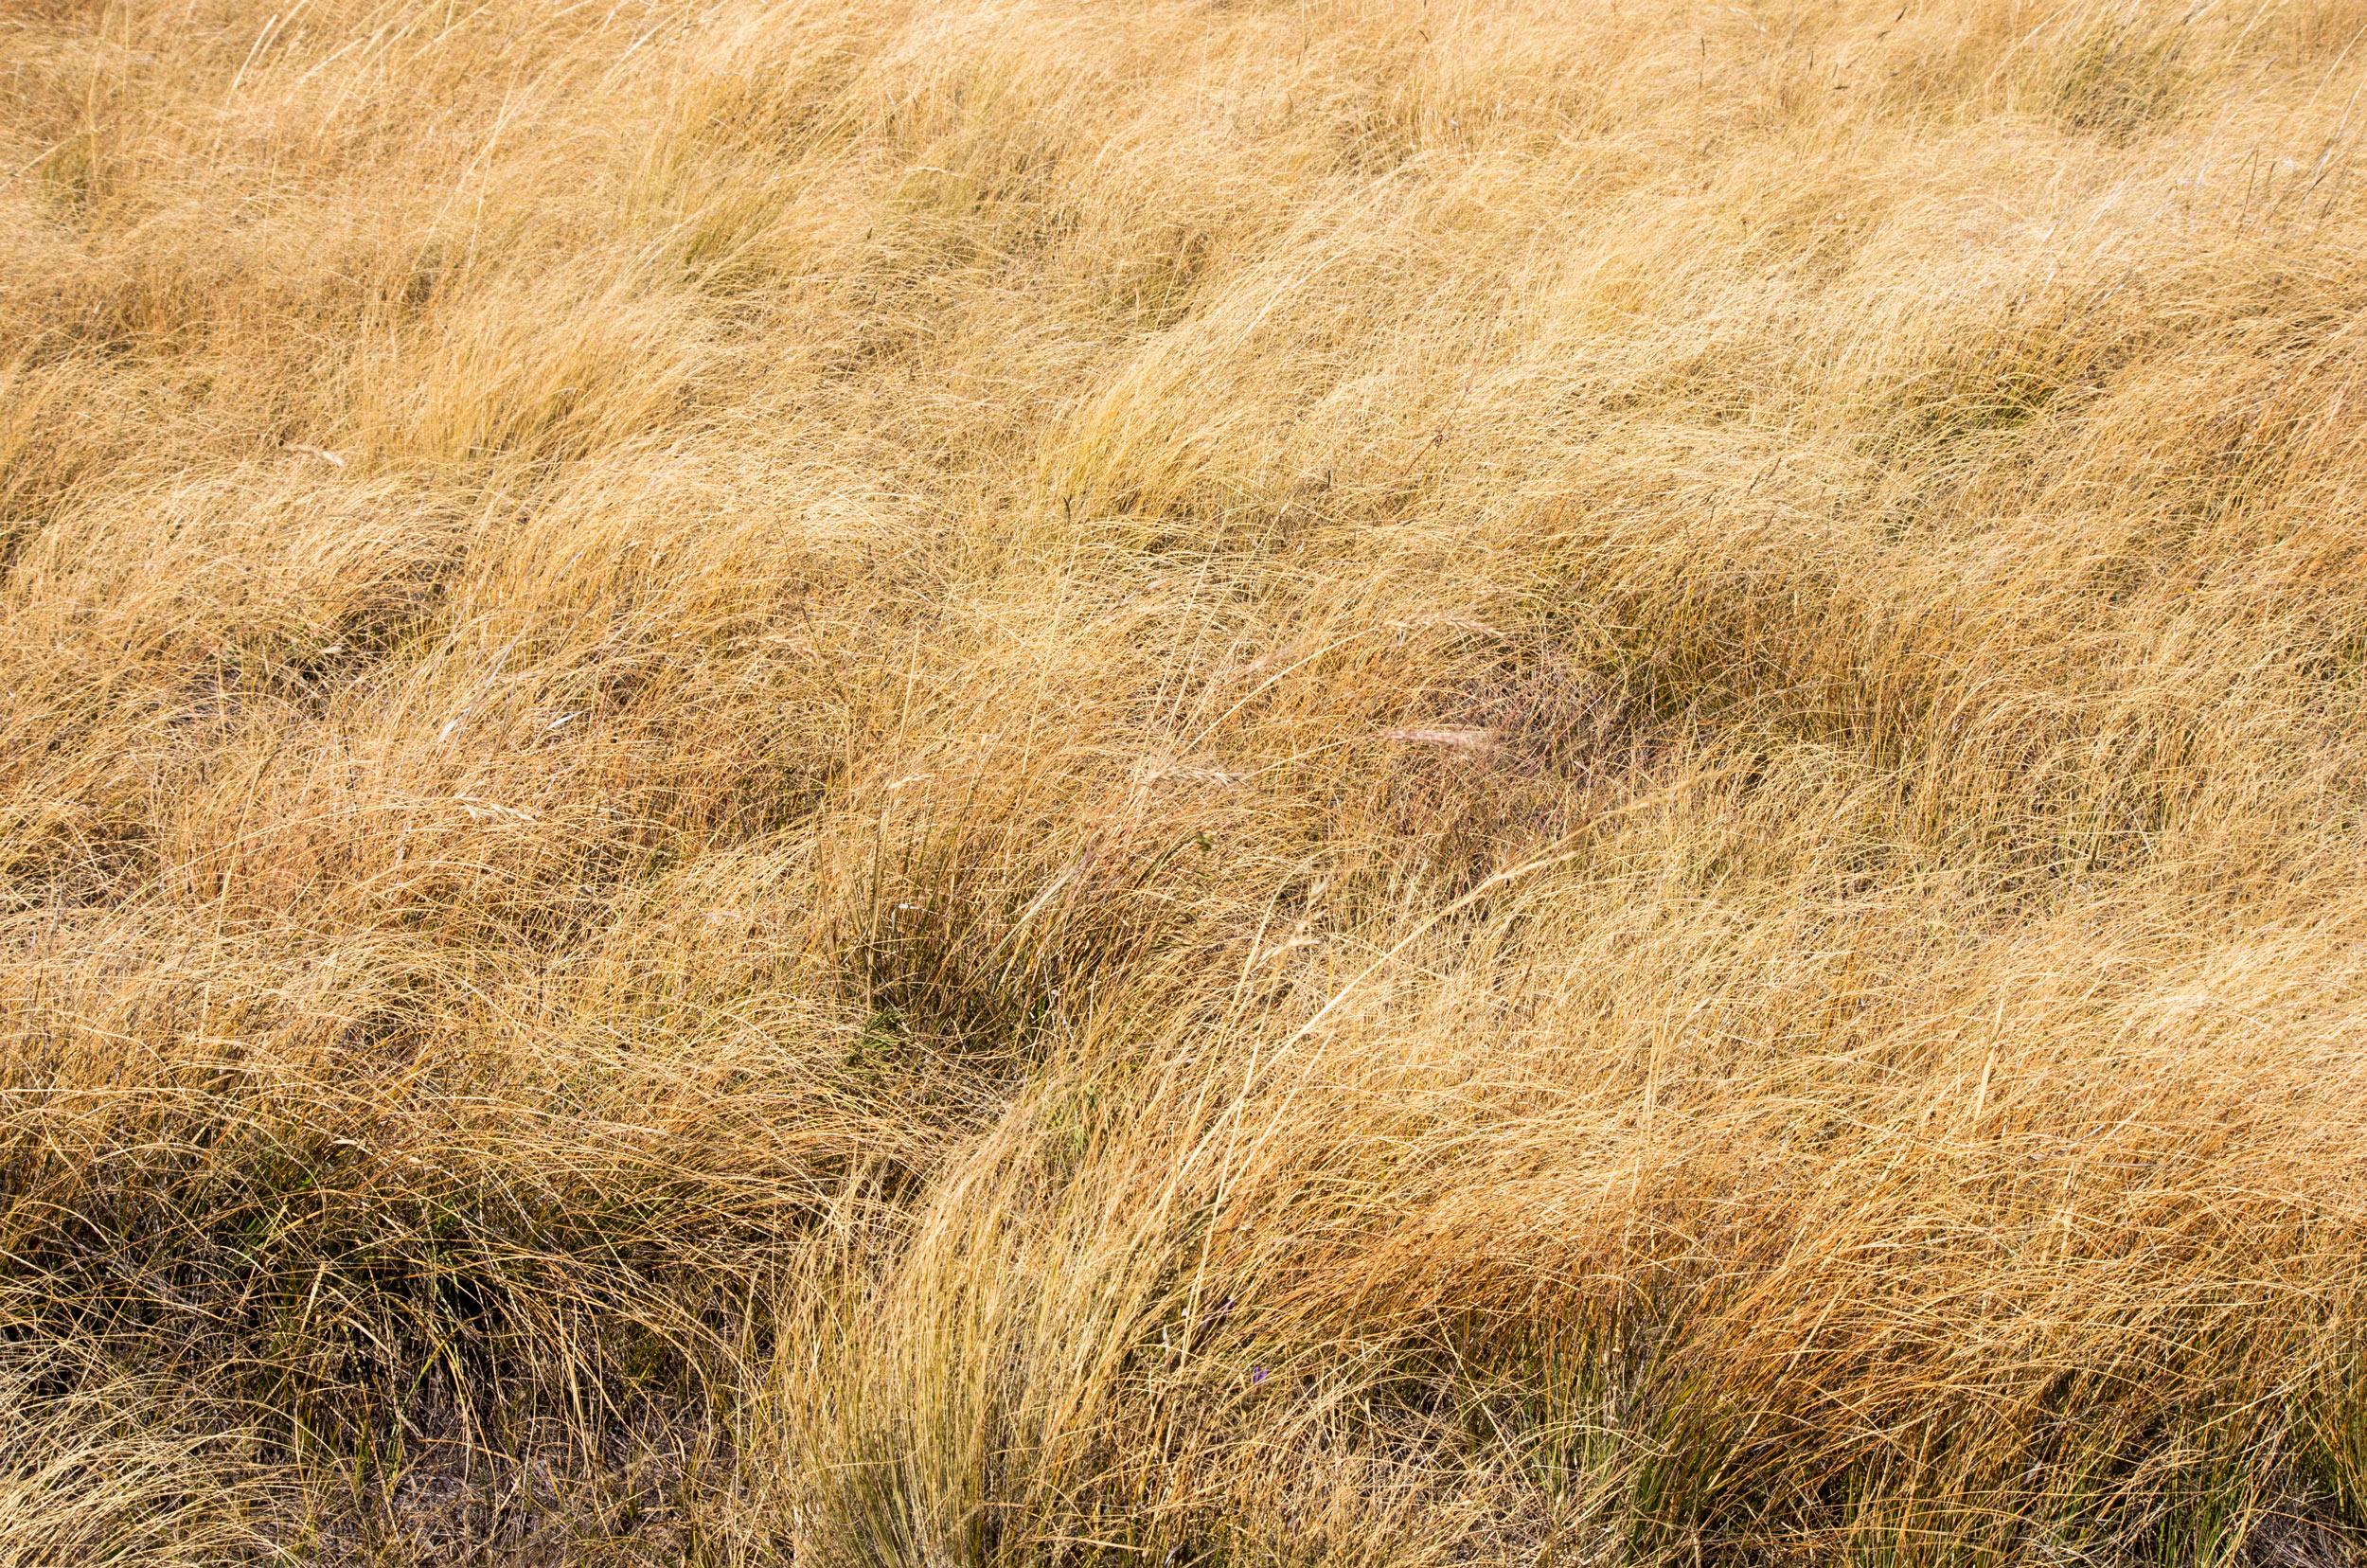 jenphotographs mueller state park mountain meadow grass